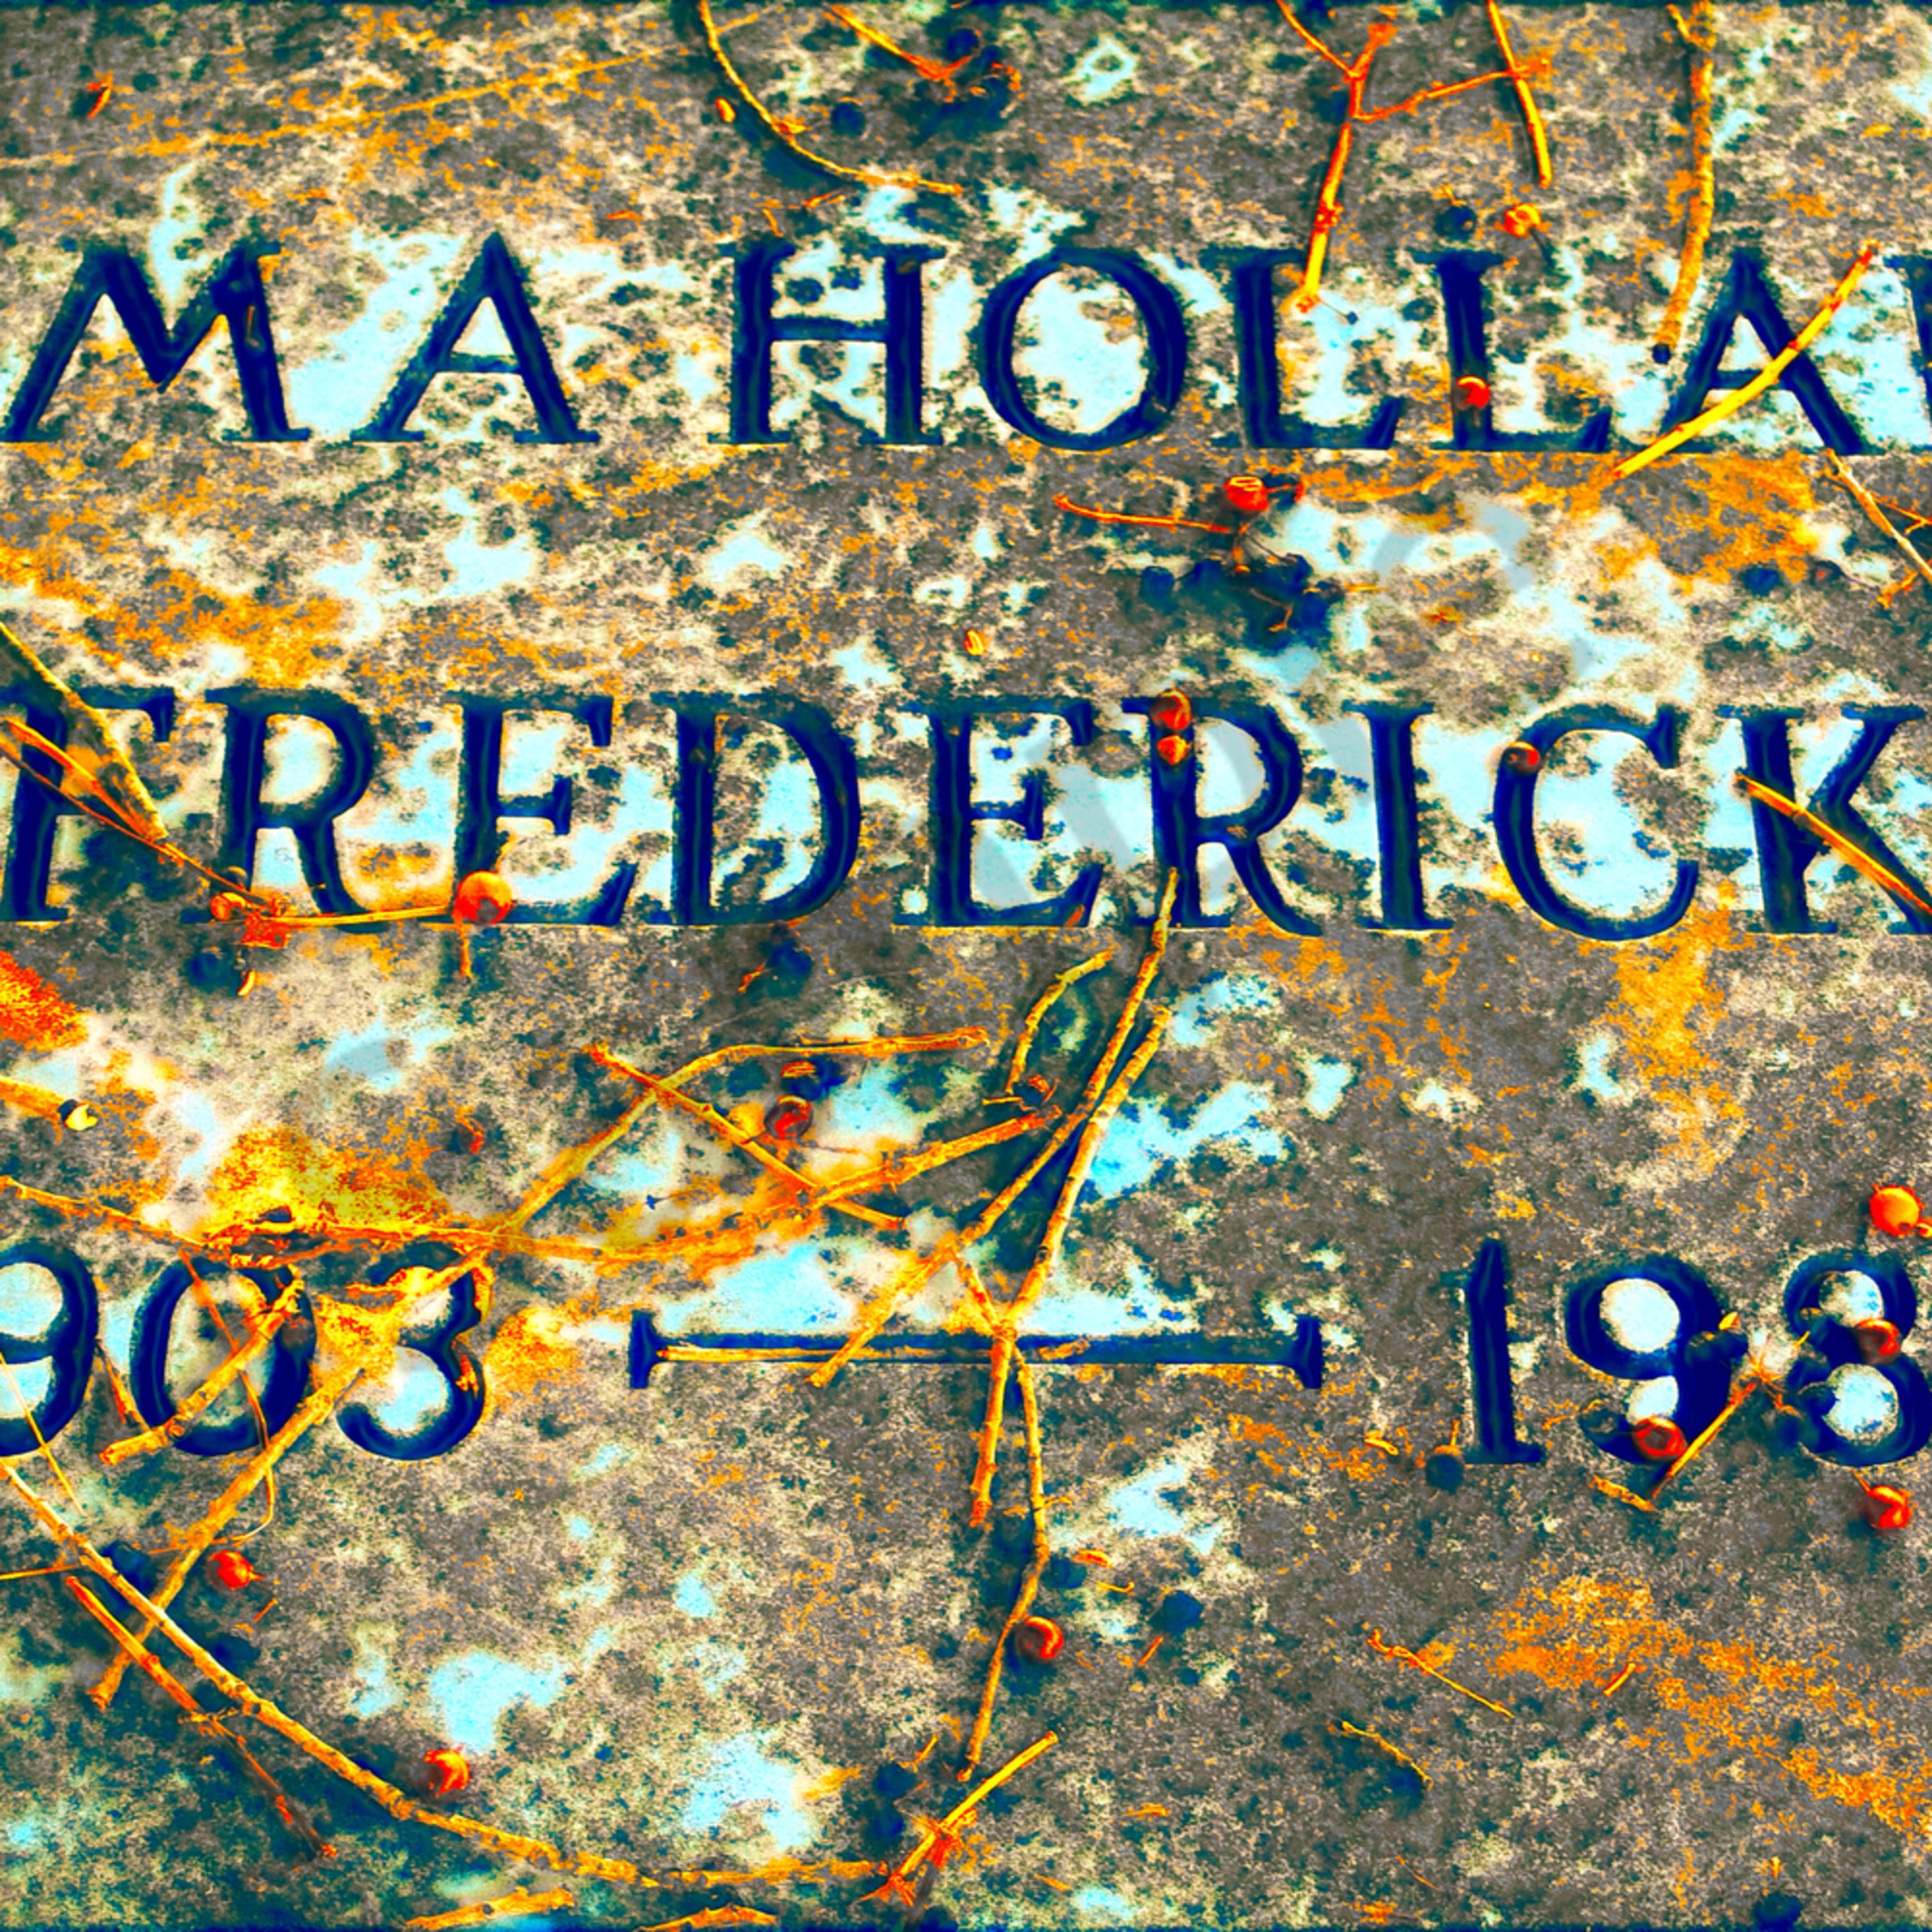 Elma holland frederick gravestone website hbxlow